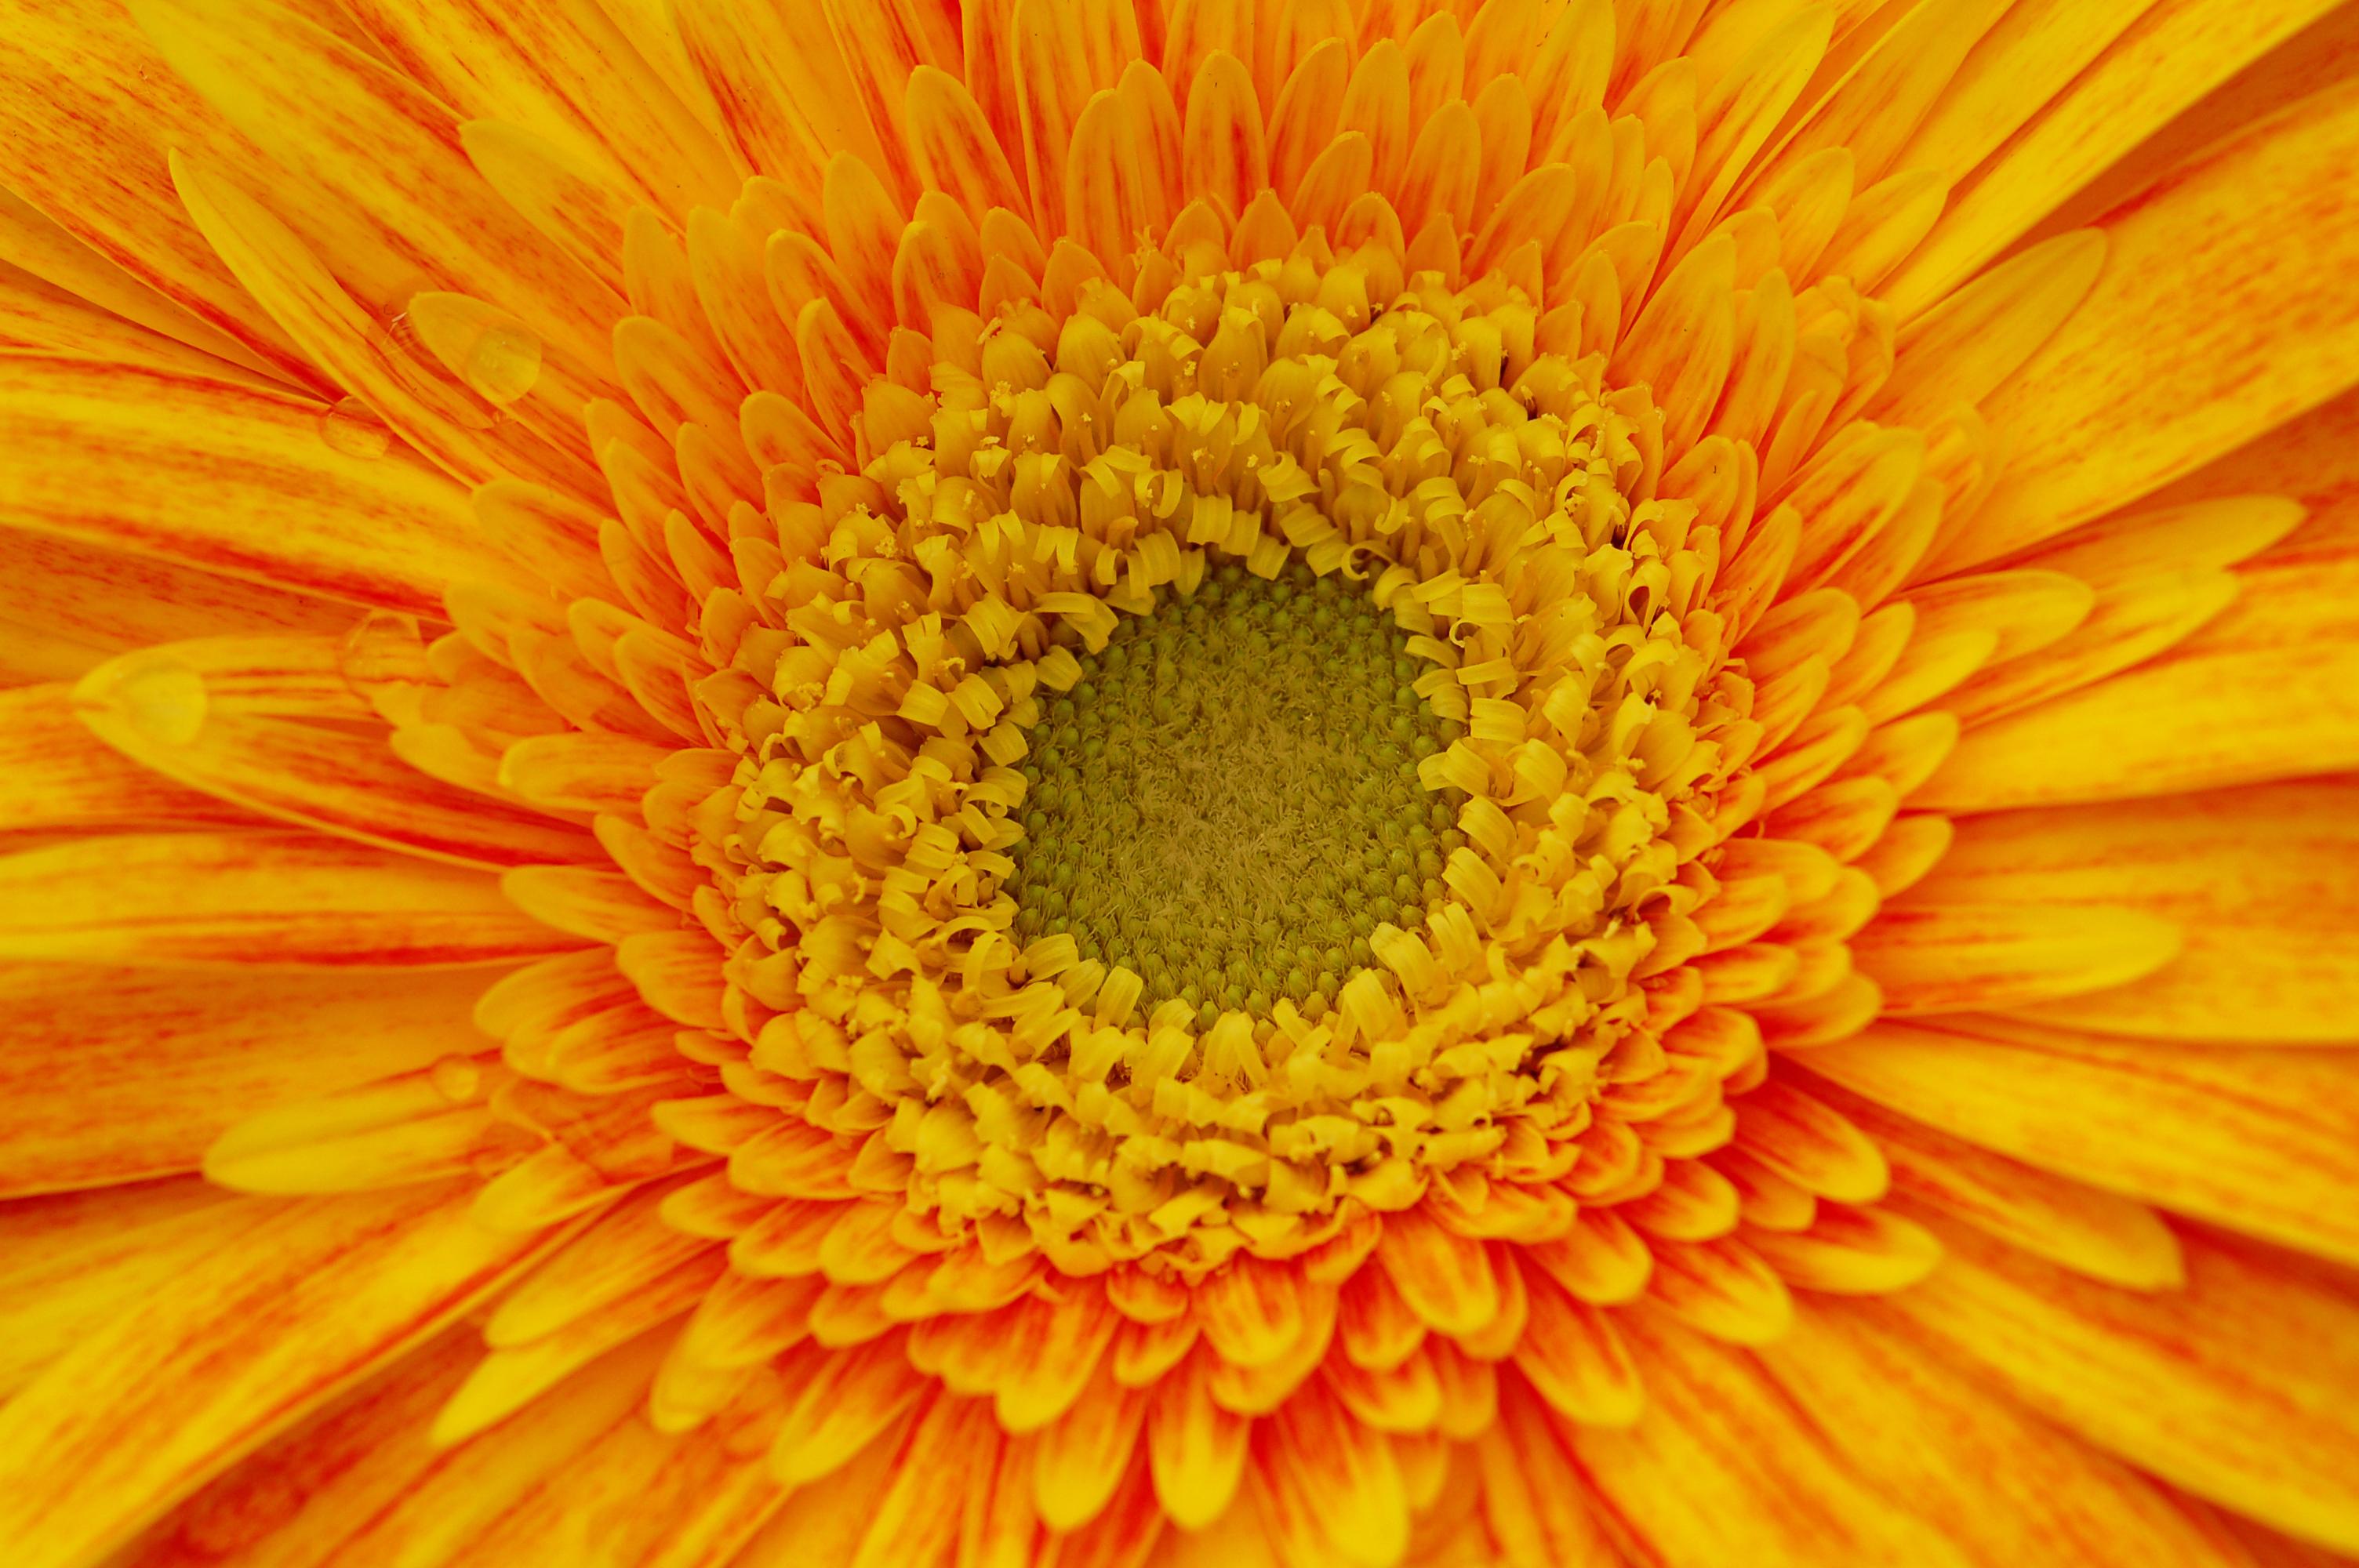 Yellow and Orange Gerbera Daisy Flower | Design Bundles